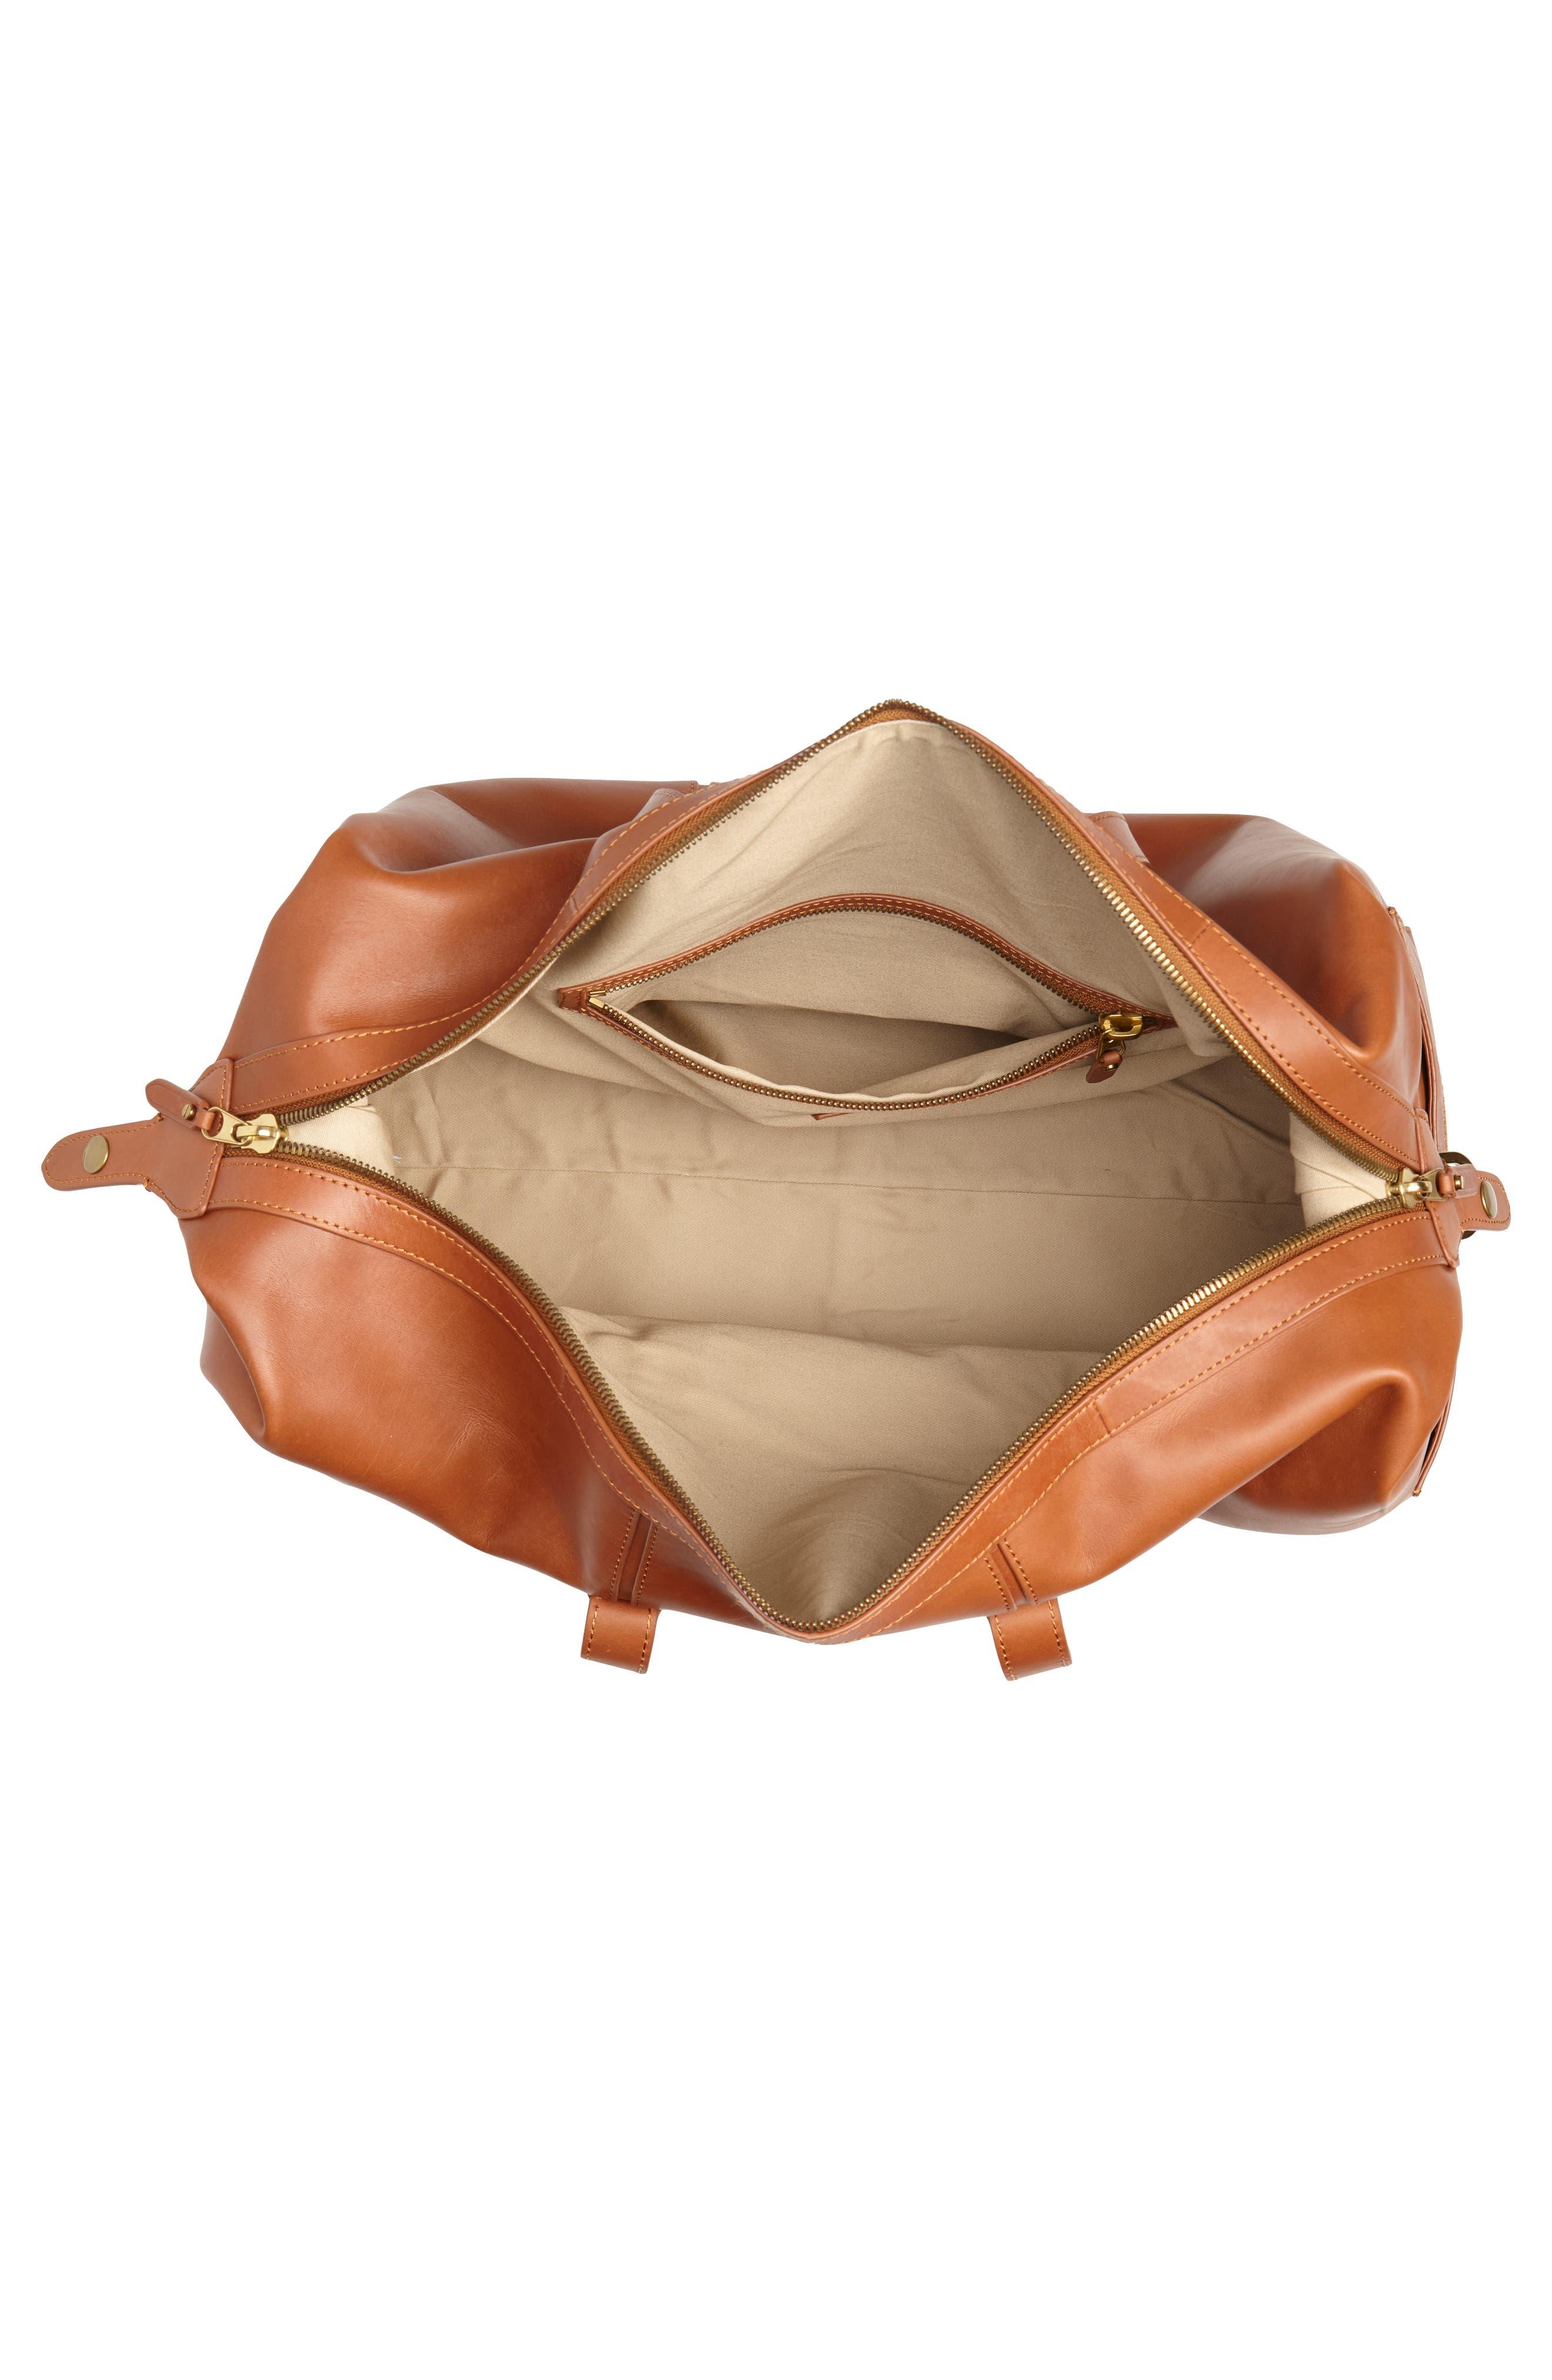 Oar Stripe Weekend Bag,                             Alternate thumbnail 4, color,                             BURNISHED SIENNA